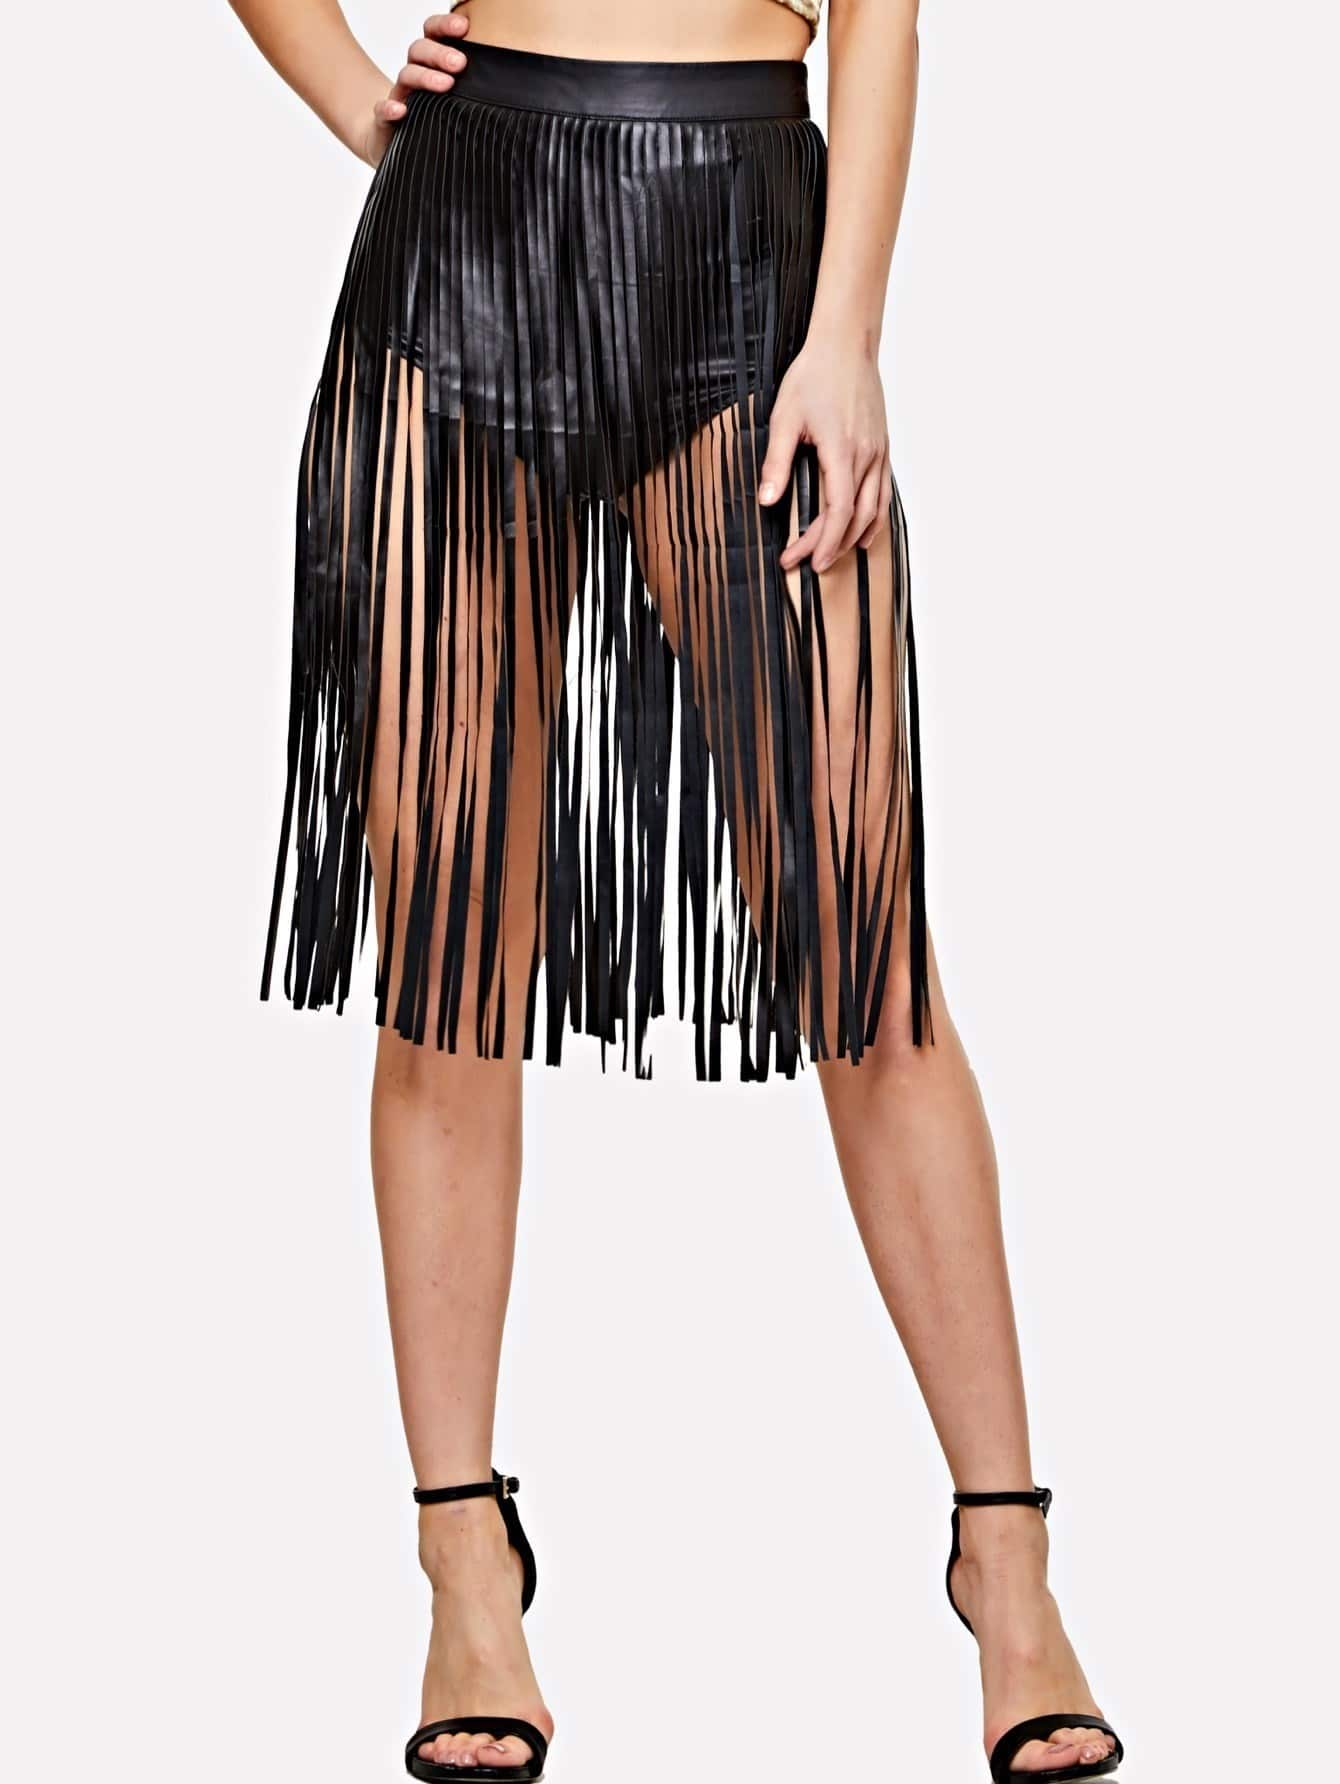 Faux Leather Fringe Skirt christine darvin new ego men